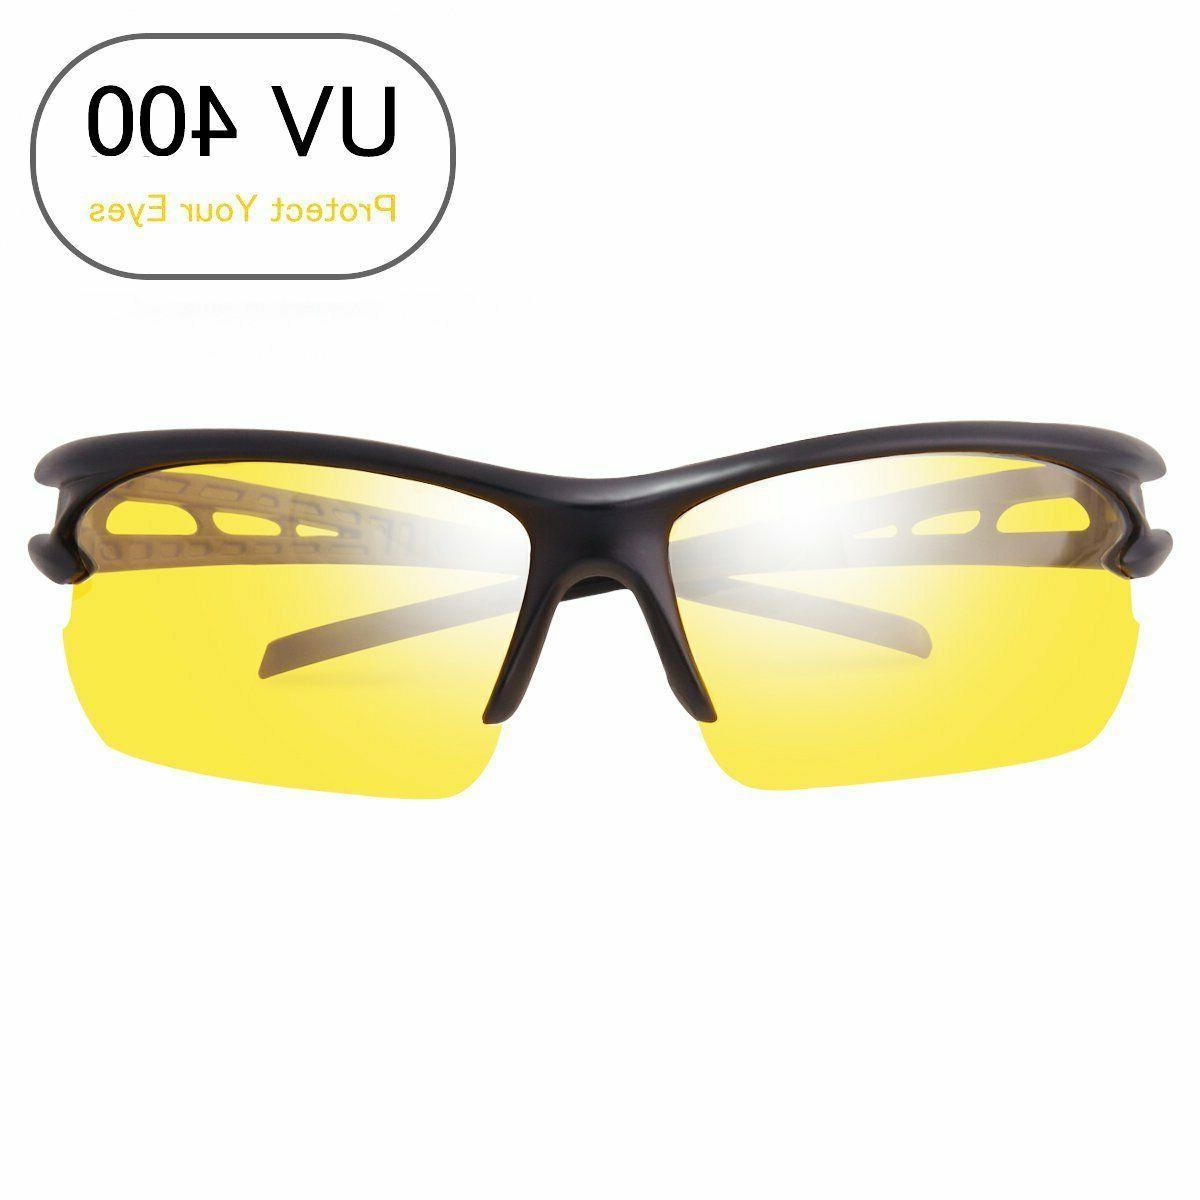 New HD Day Vision Sunglasses